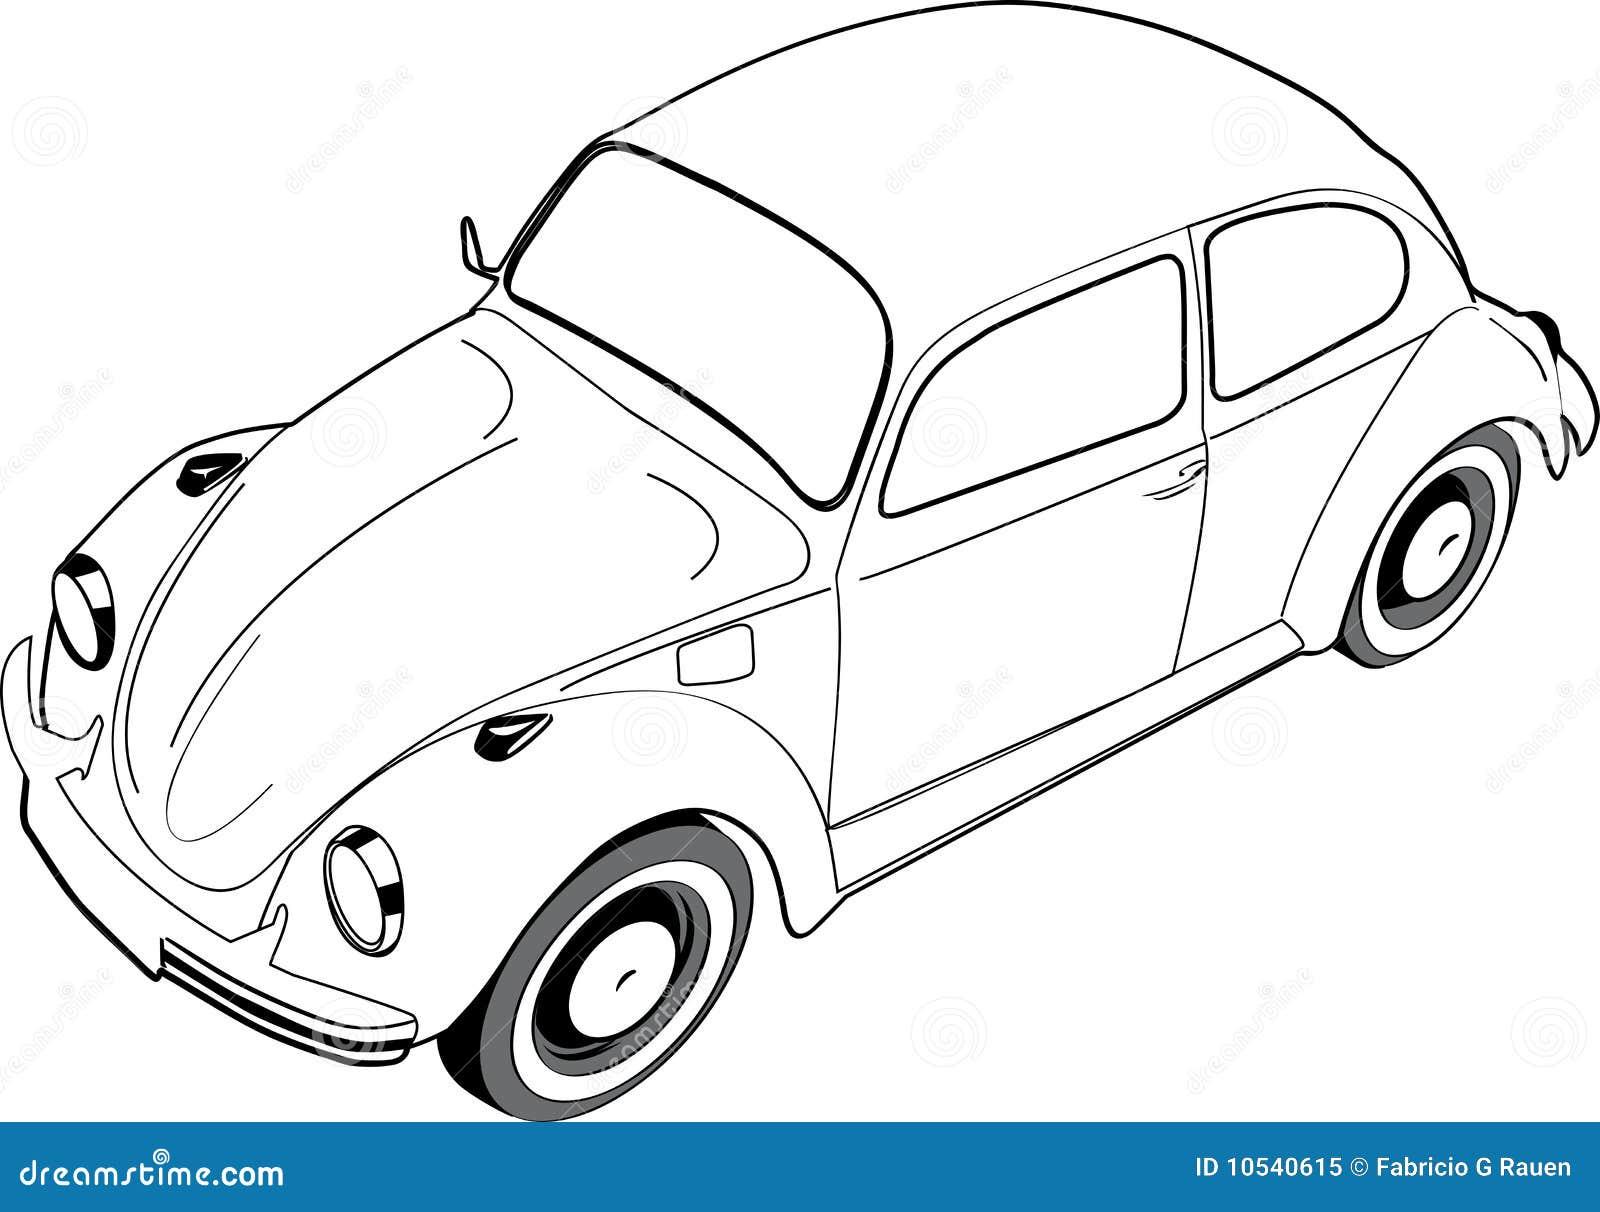 volkswagen kever auto electrical wiring diagram Diagram for 1971 VW Super Beetle Engine de kever of het insect van volkswagon royalty